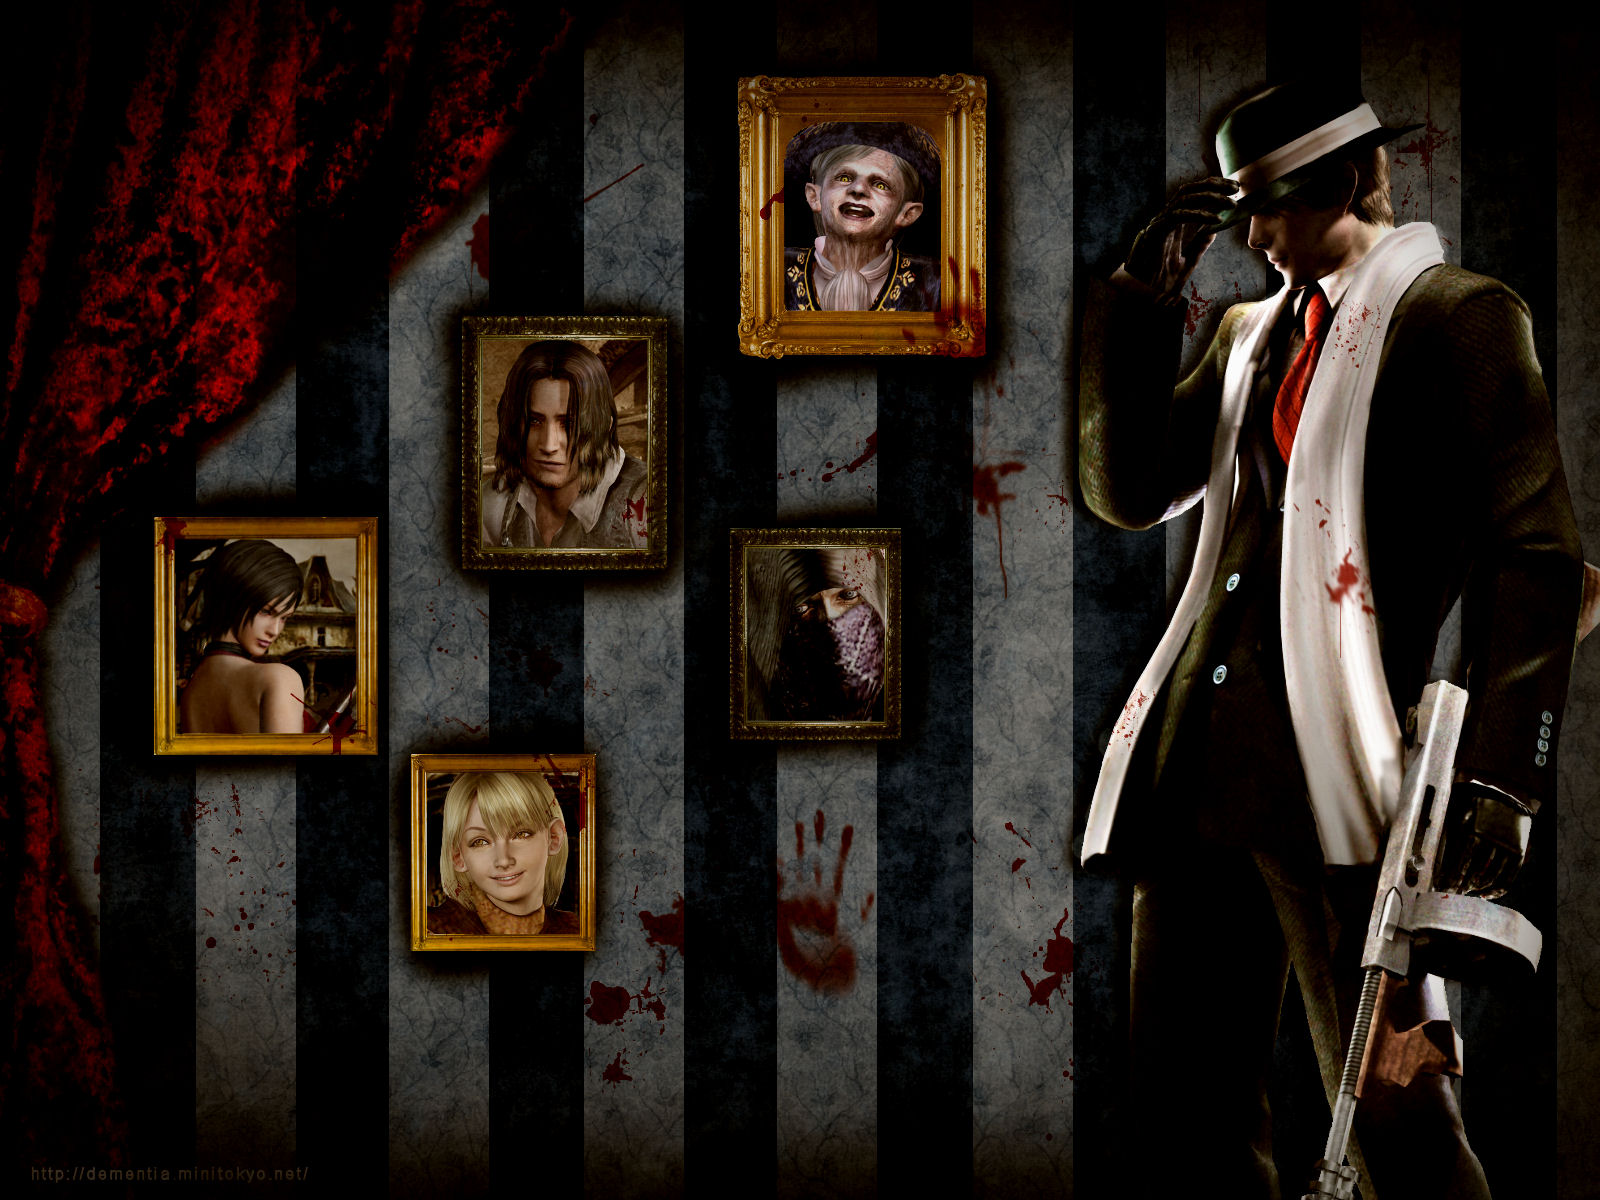 Resident Evil 4 Wallpaper First Class Script Minitokyo